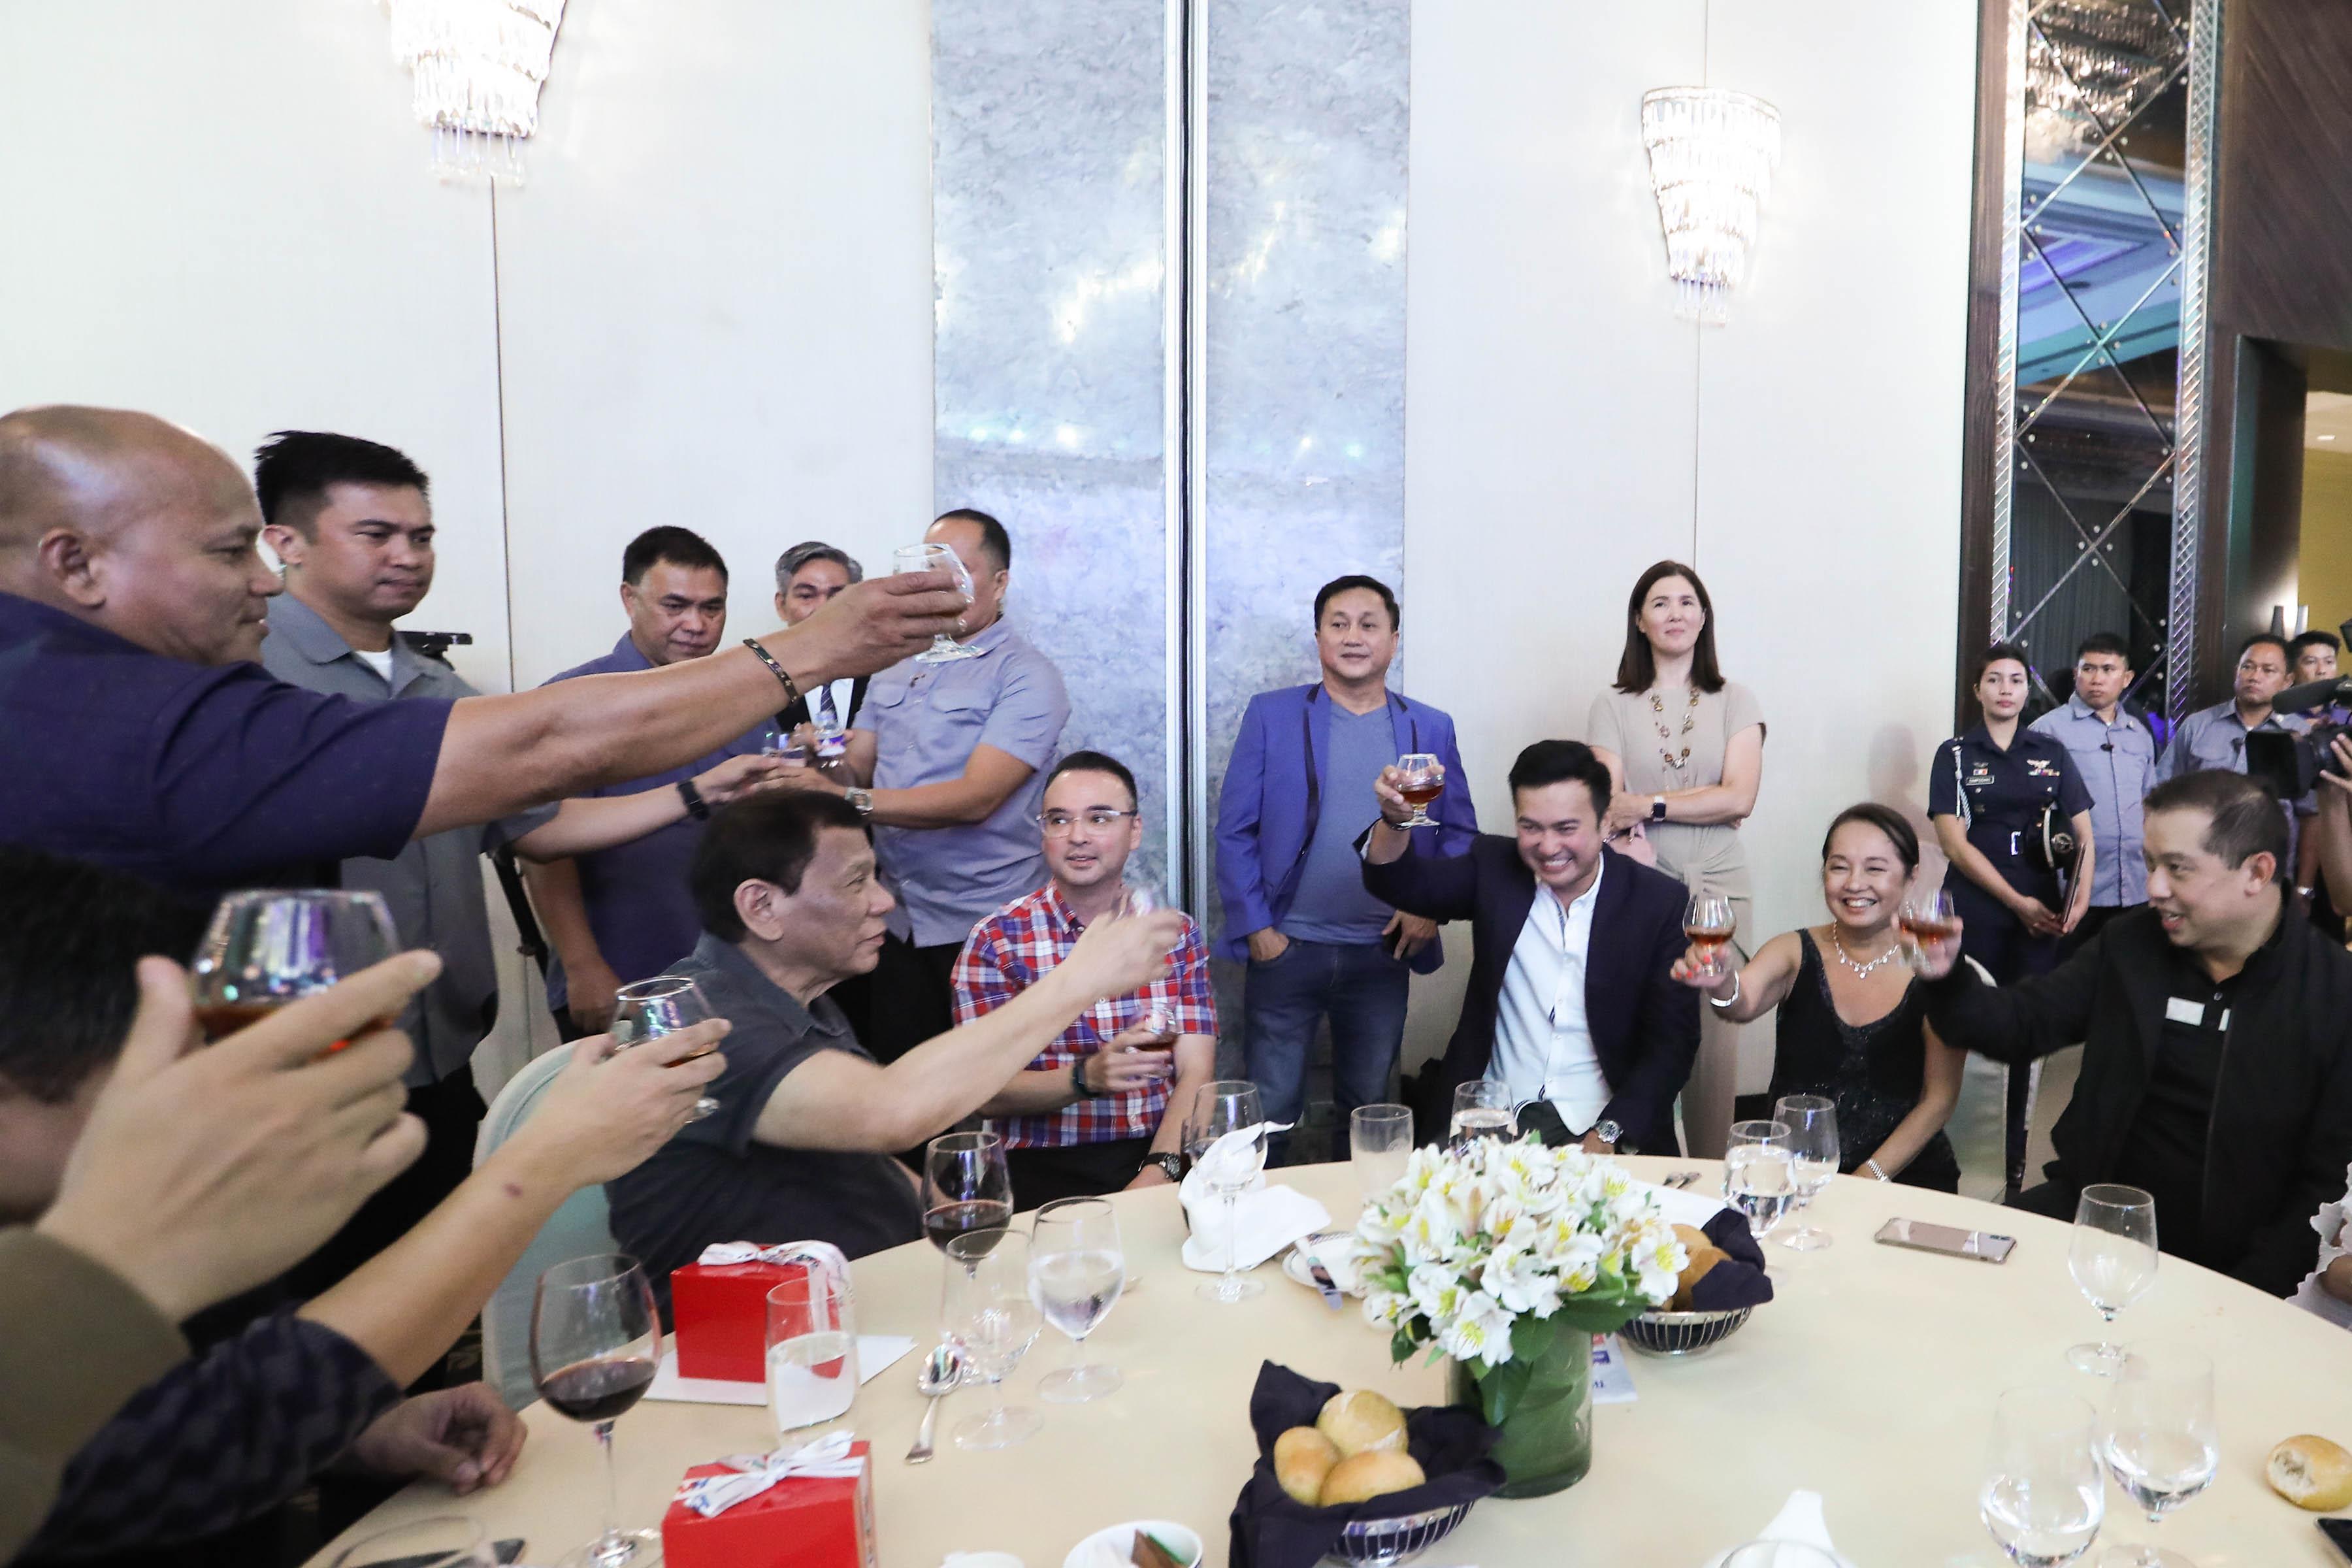 OPTICS. President Rodrigo Duterte is joined in his table by speaker hopefuls. Malacau00f1ang photo